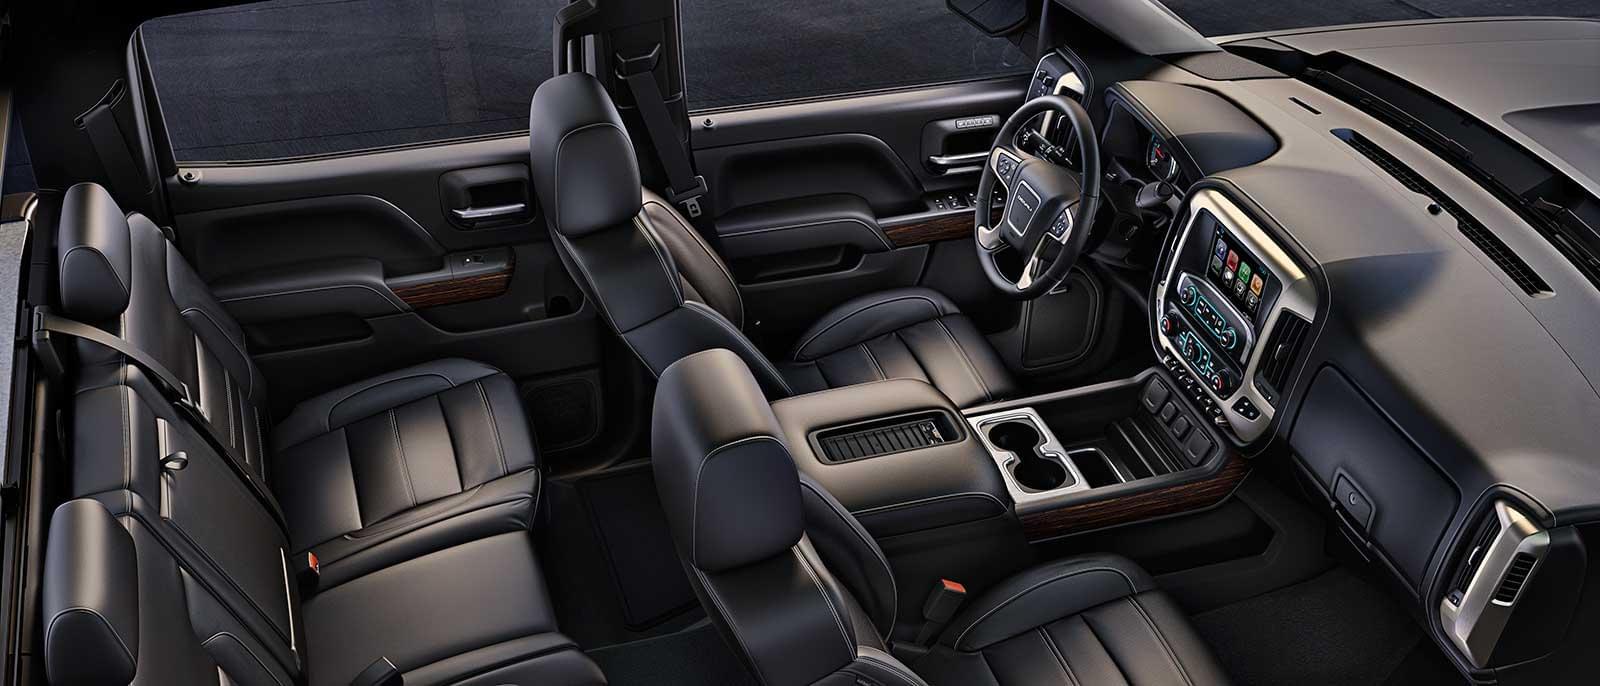 High Quality 2017 GMC Sierra 1500 Denali Interior ... Home Design Ideas